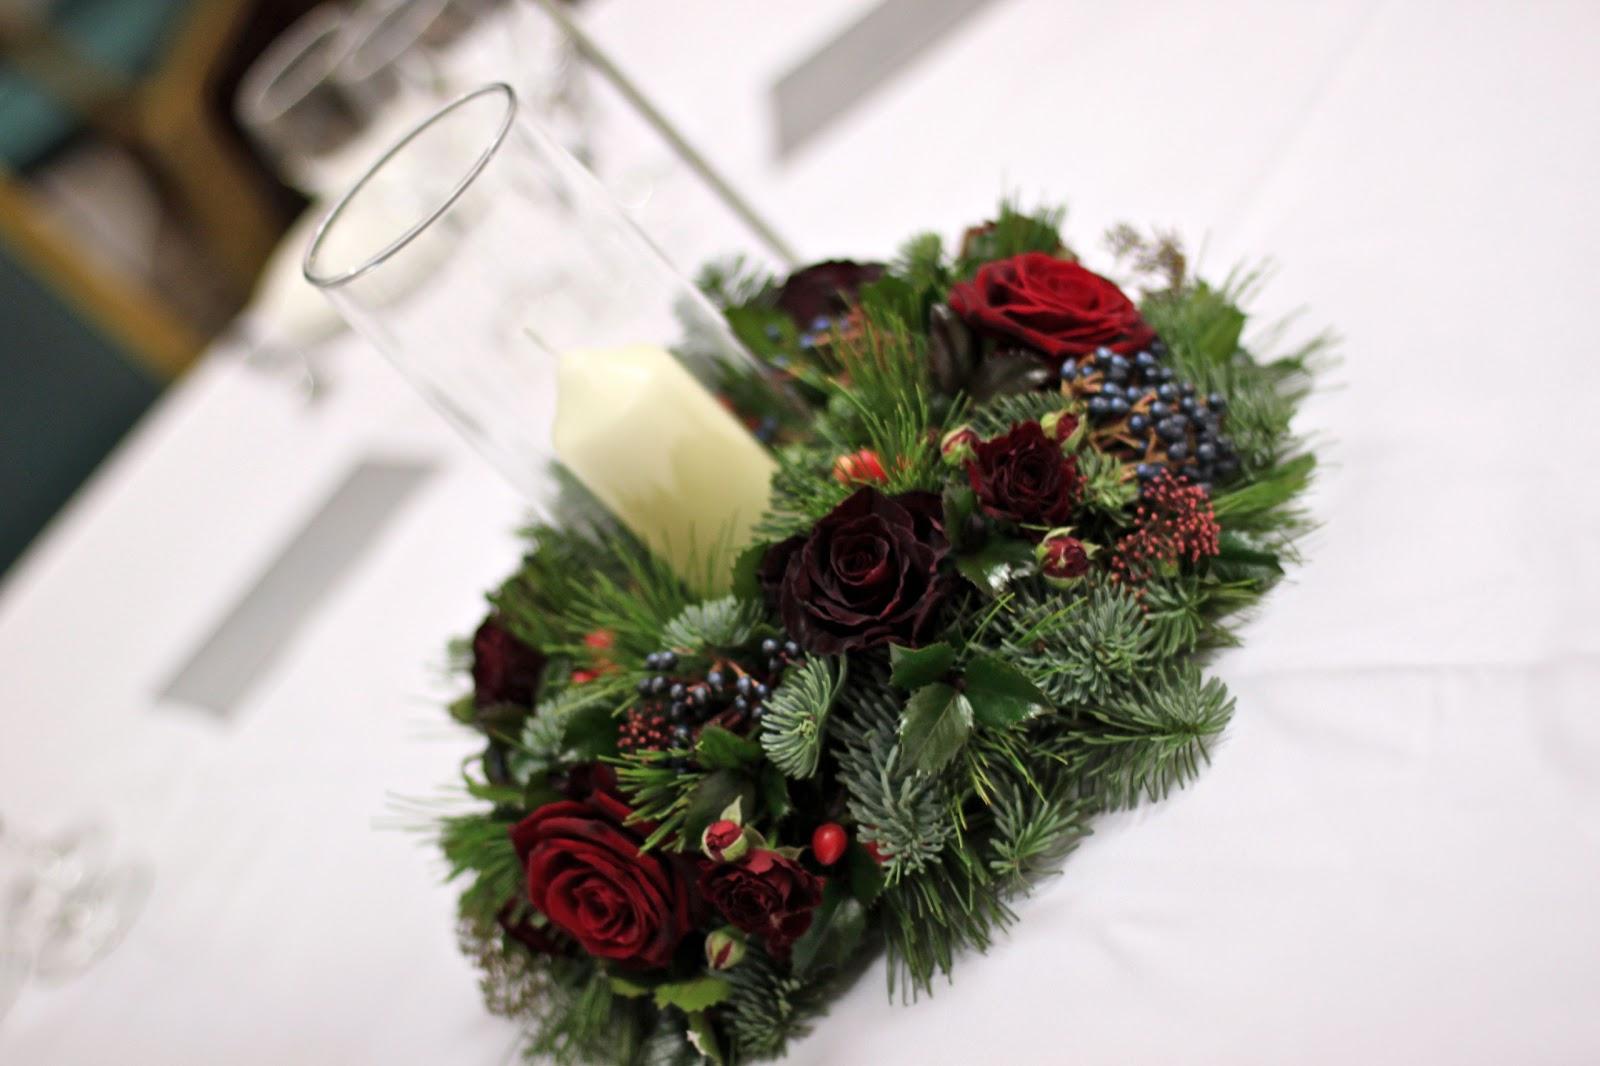 Wedding flowers blog december 2011 for Obi addobbi natalizi